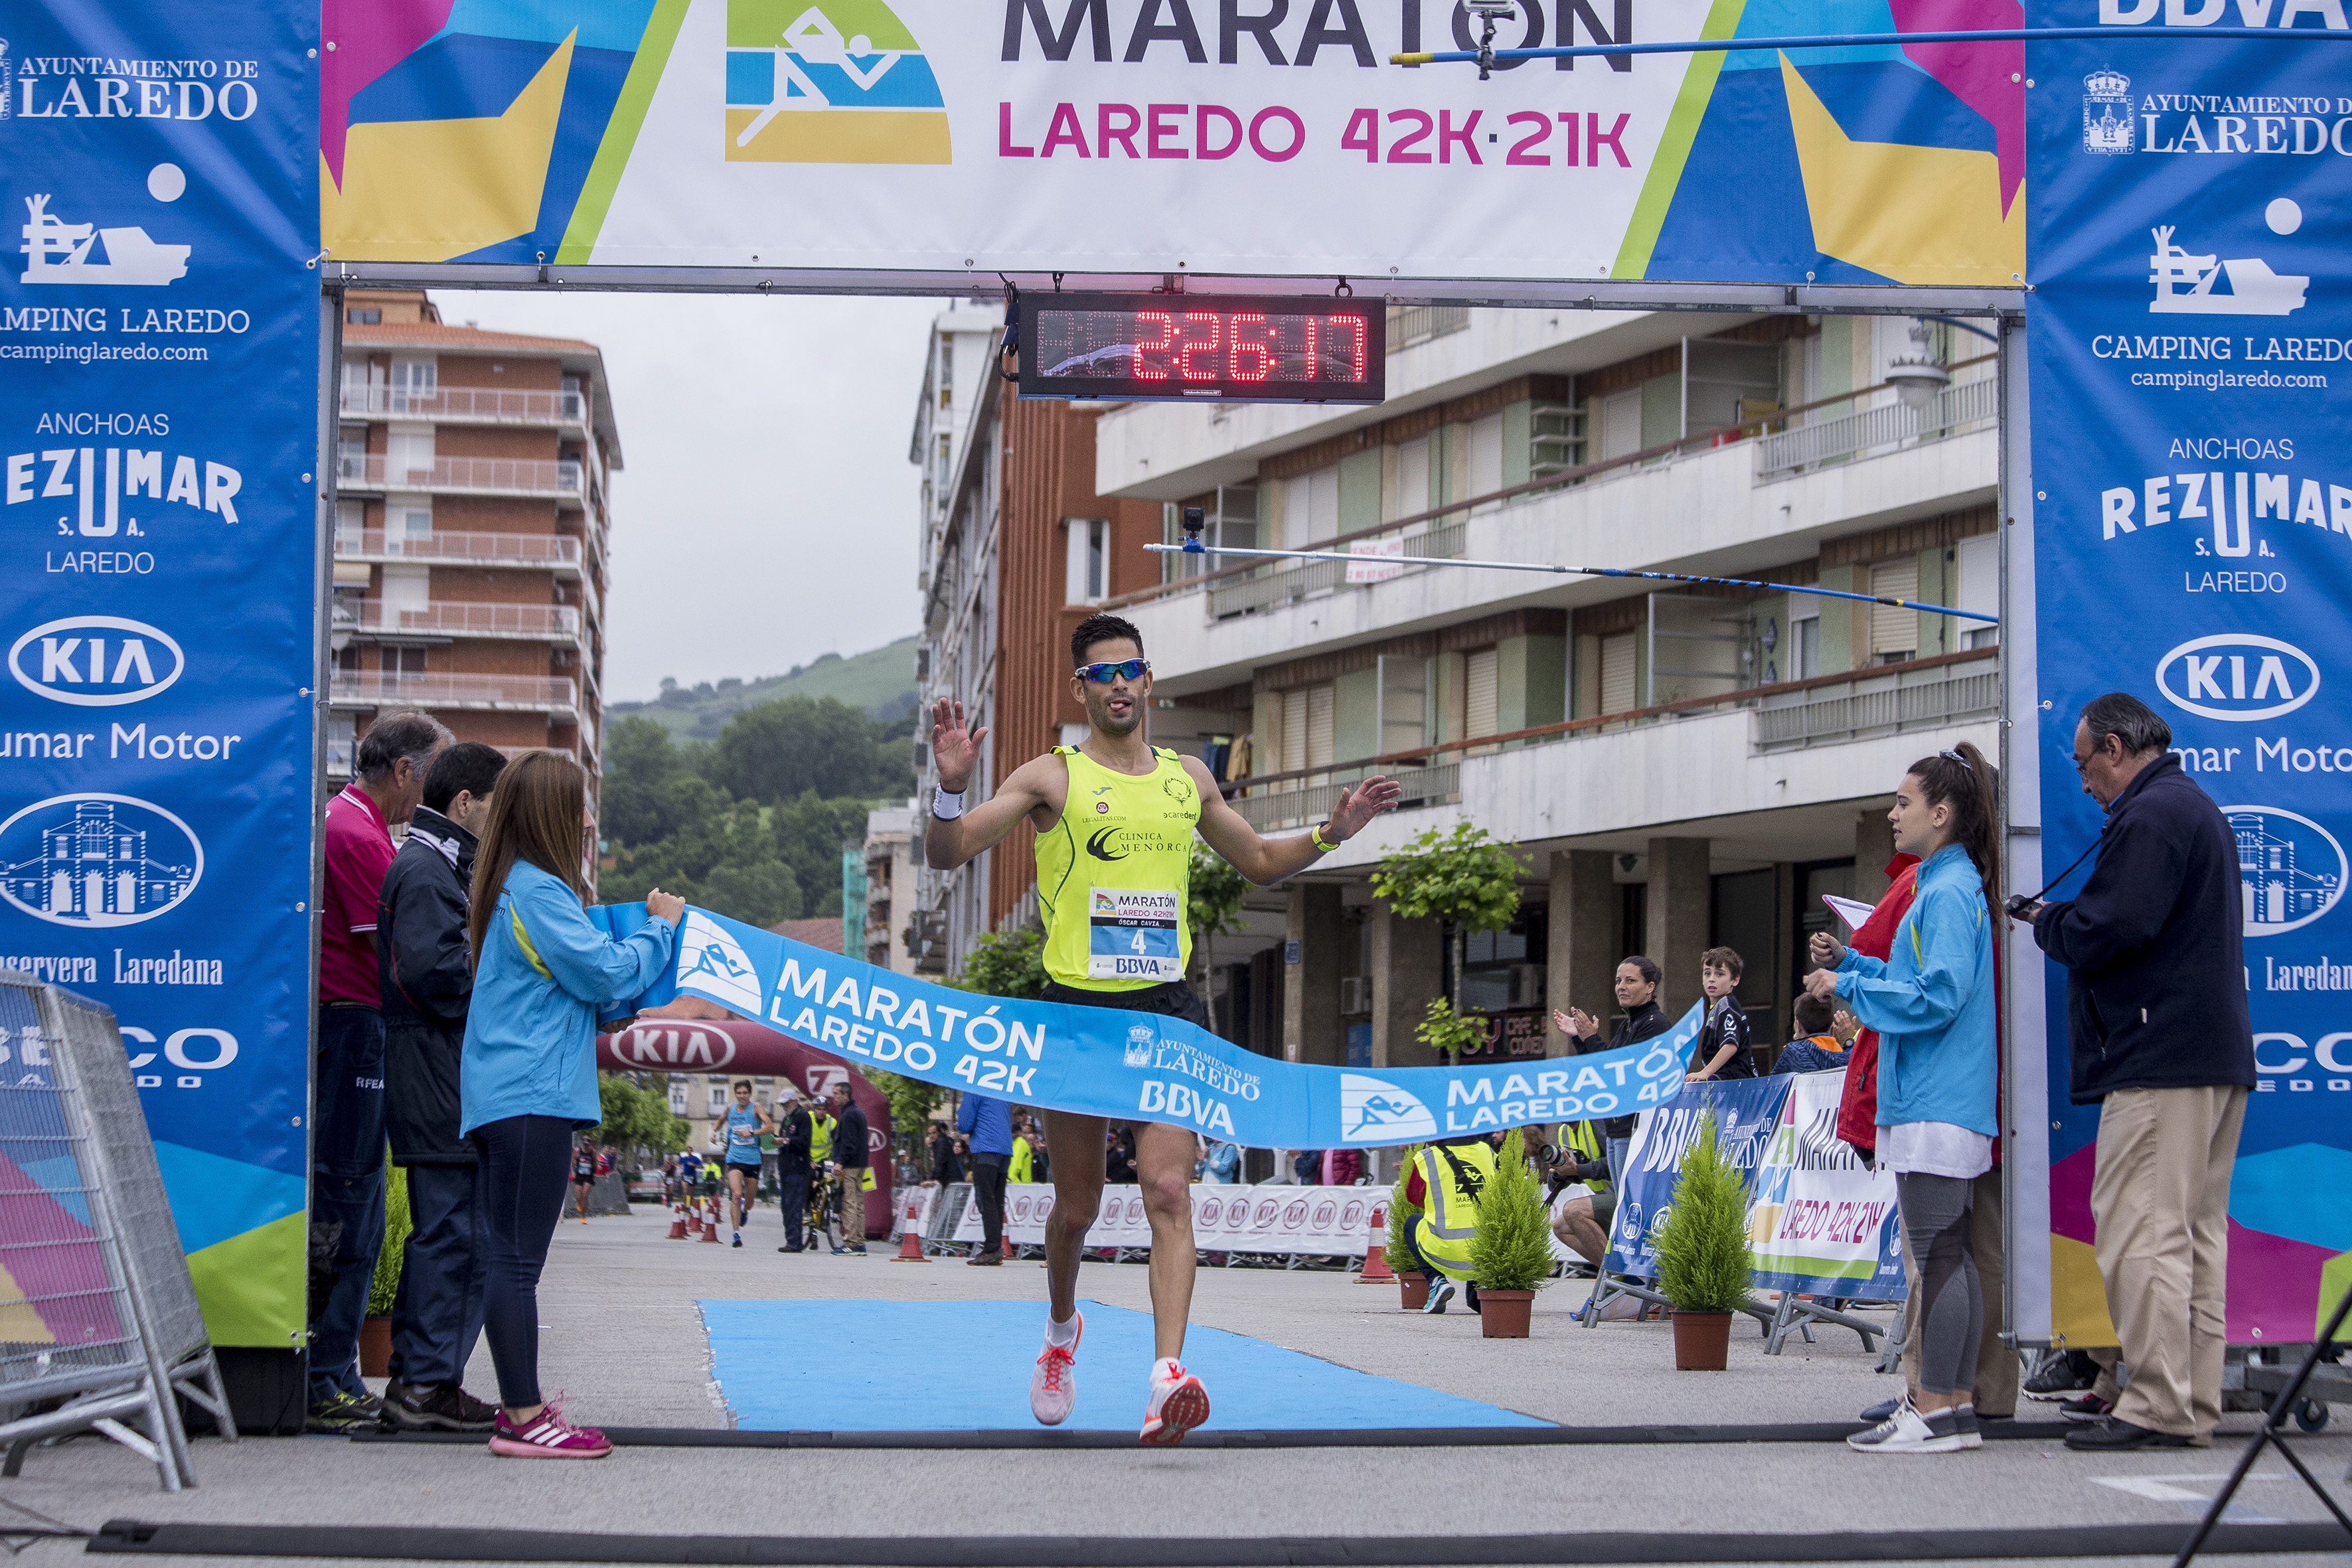 f17maratonlaredo_002